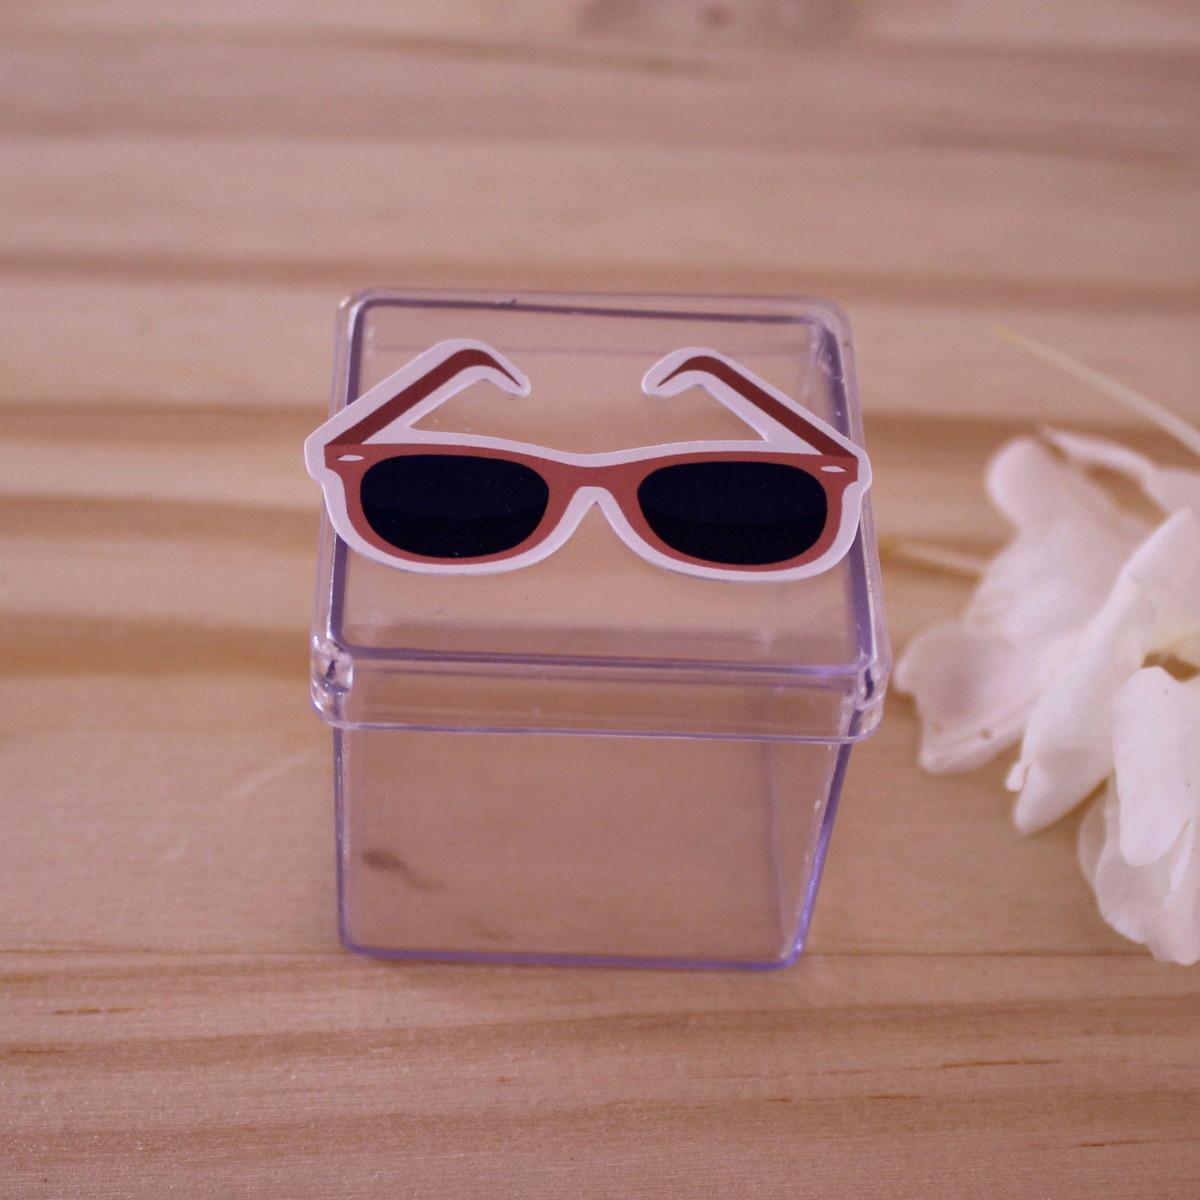 b712433dd Caixinha de acrílico - moda - óculos de sol no Elo7   A Carol que ...